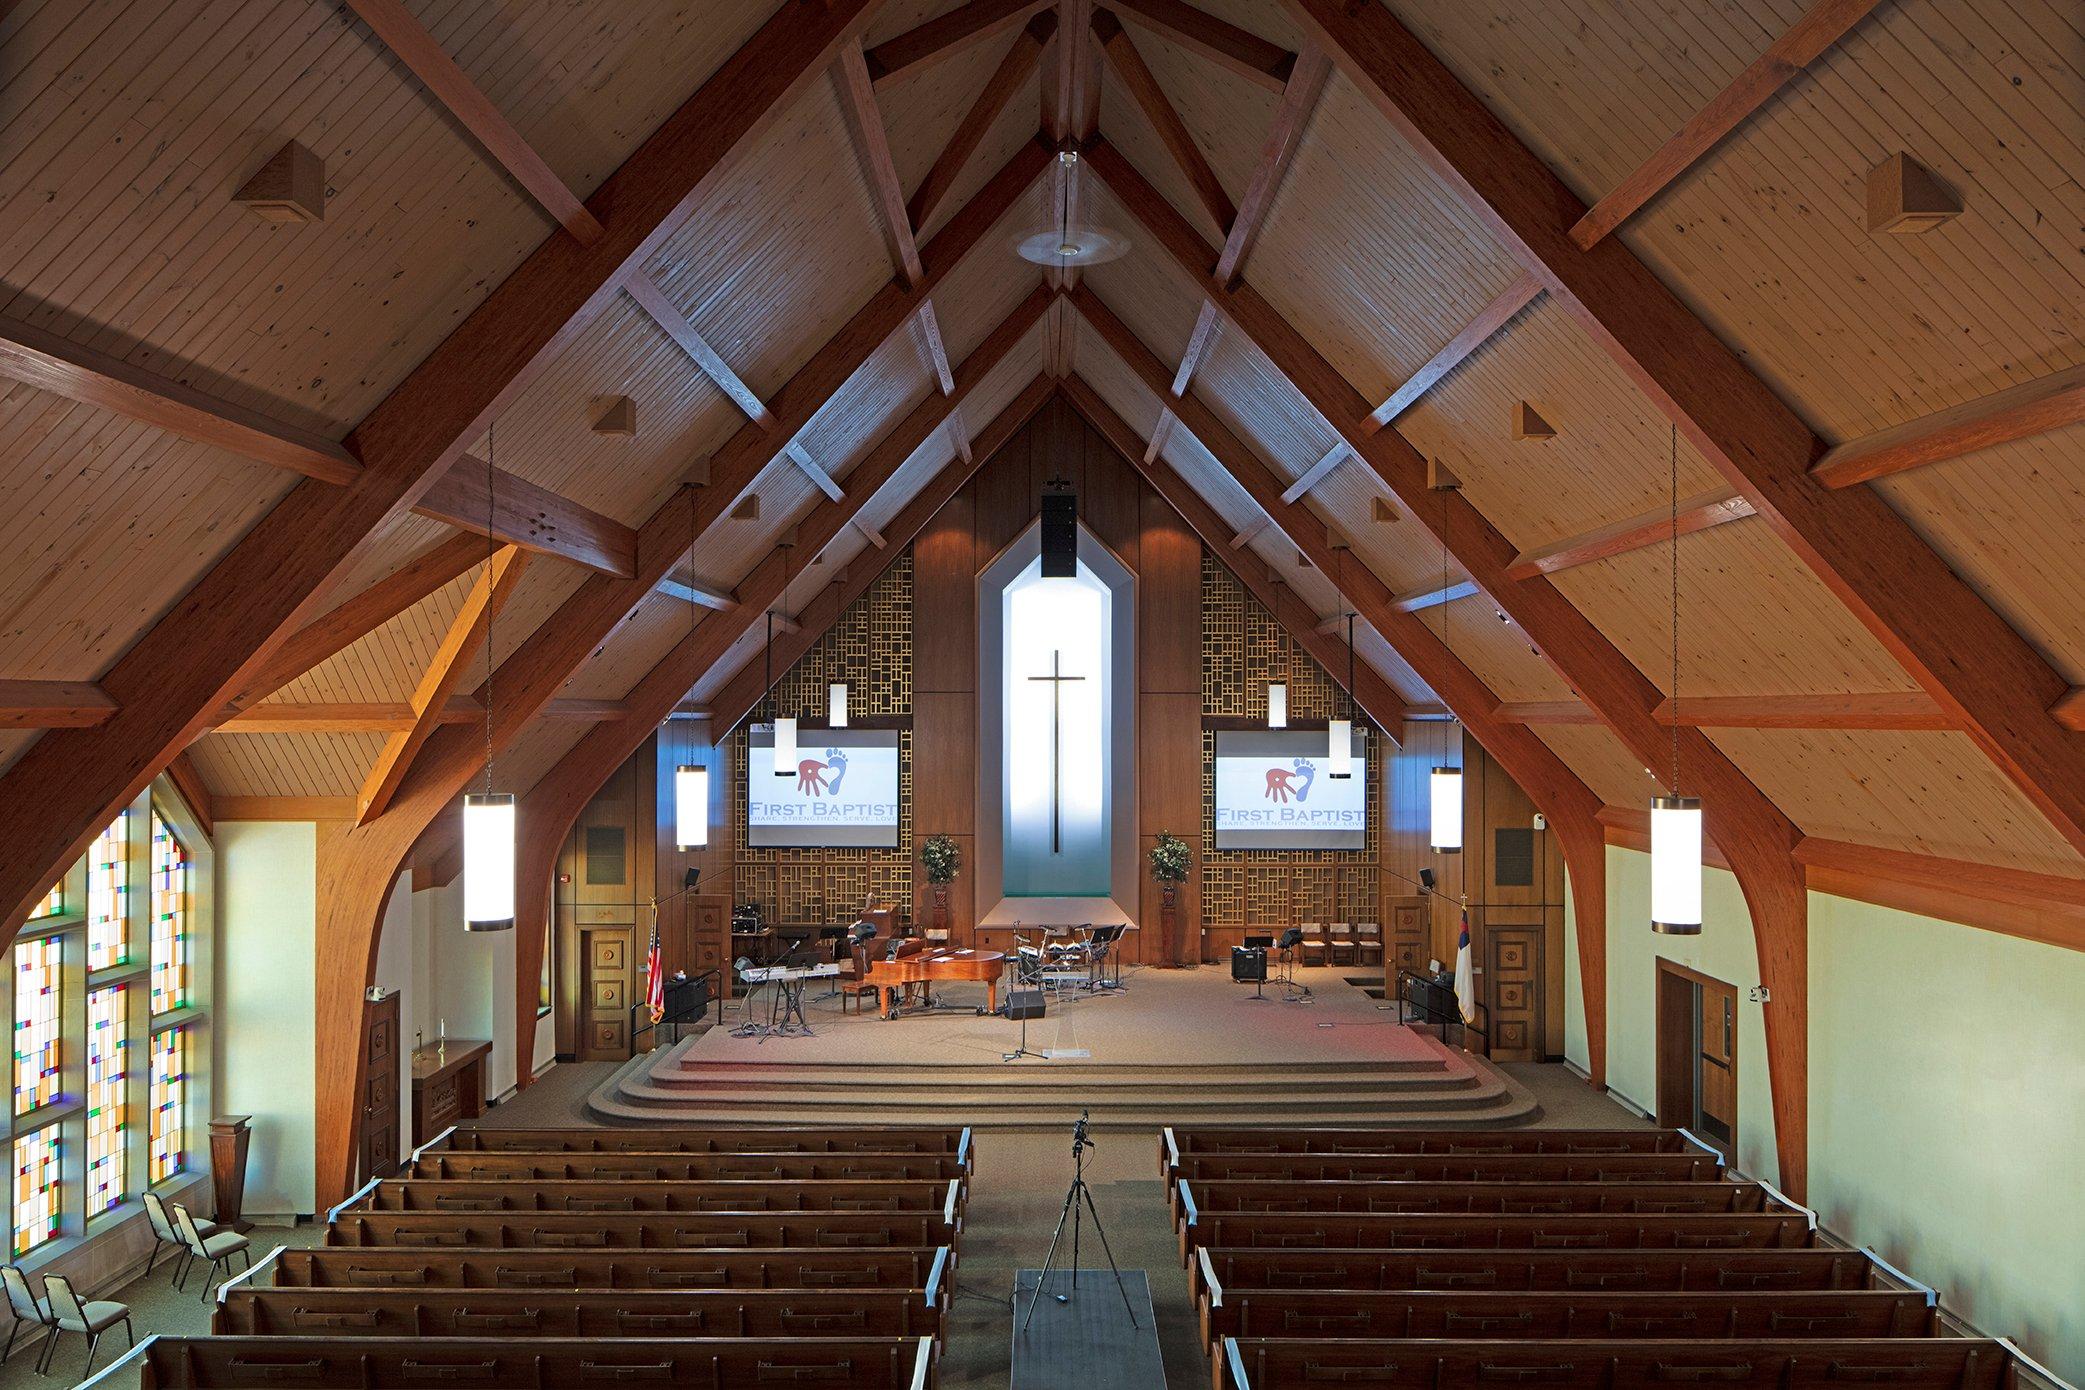 first-baptist-church-of-greensburg-worship